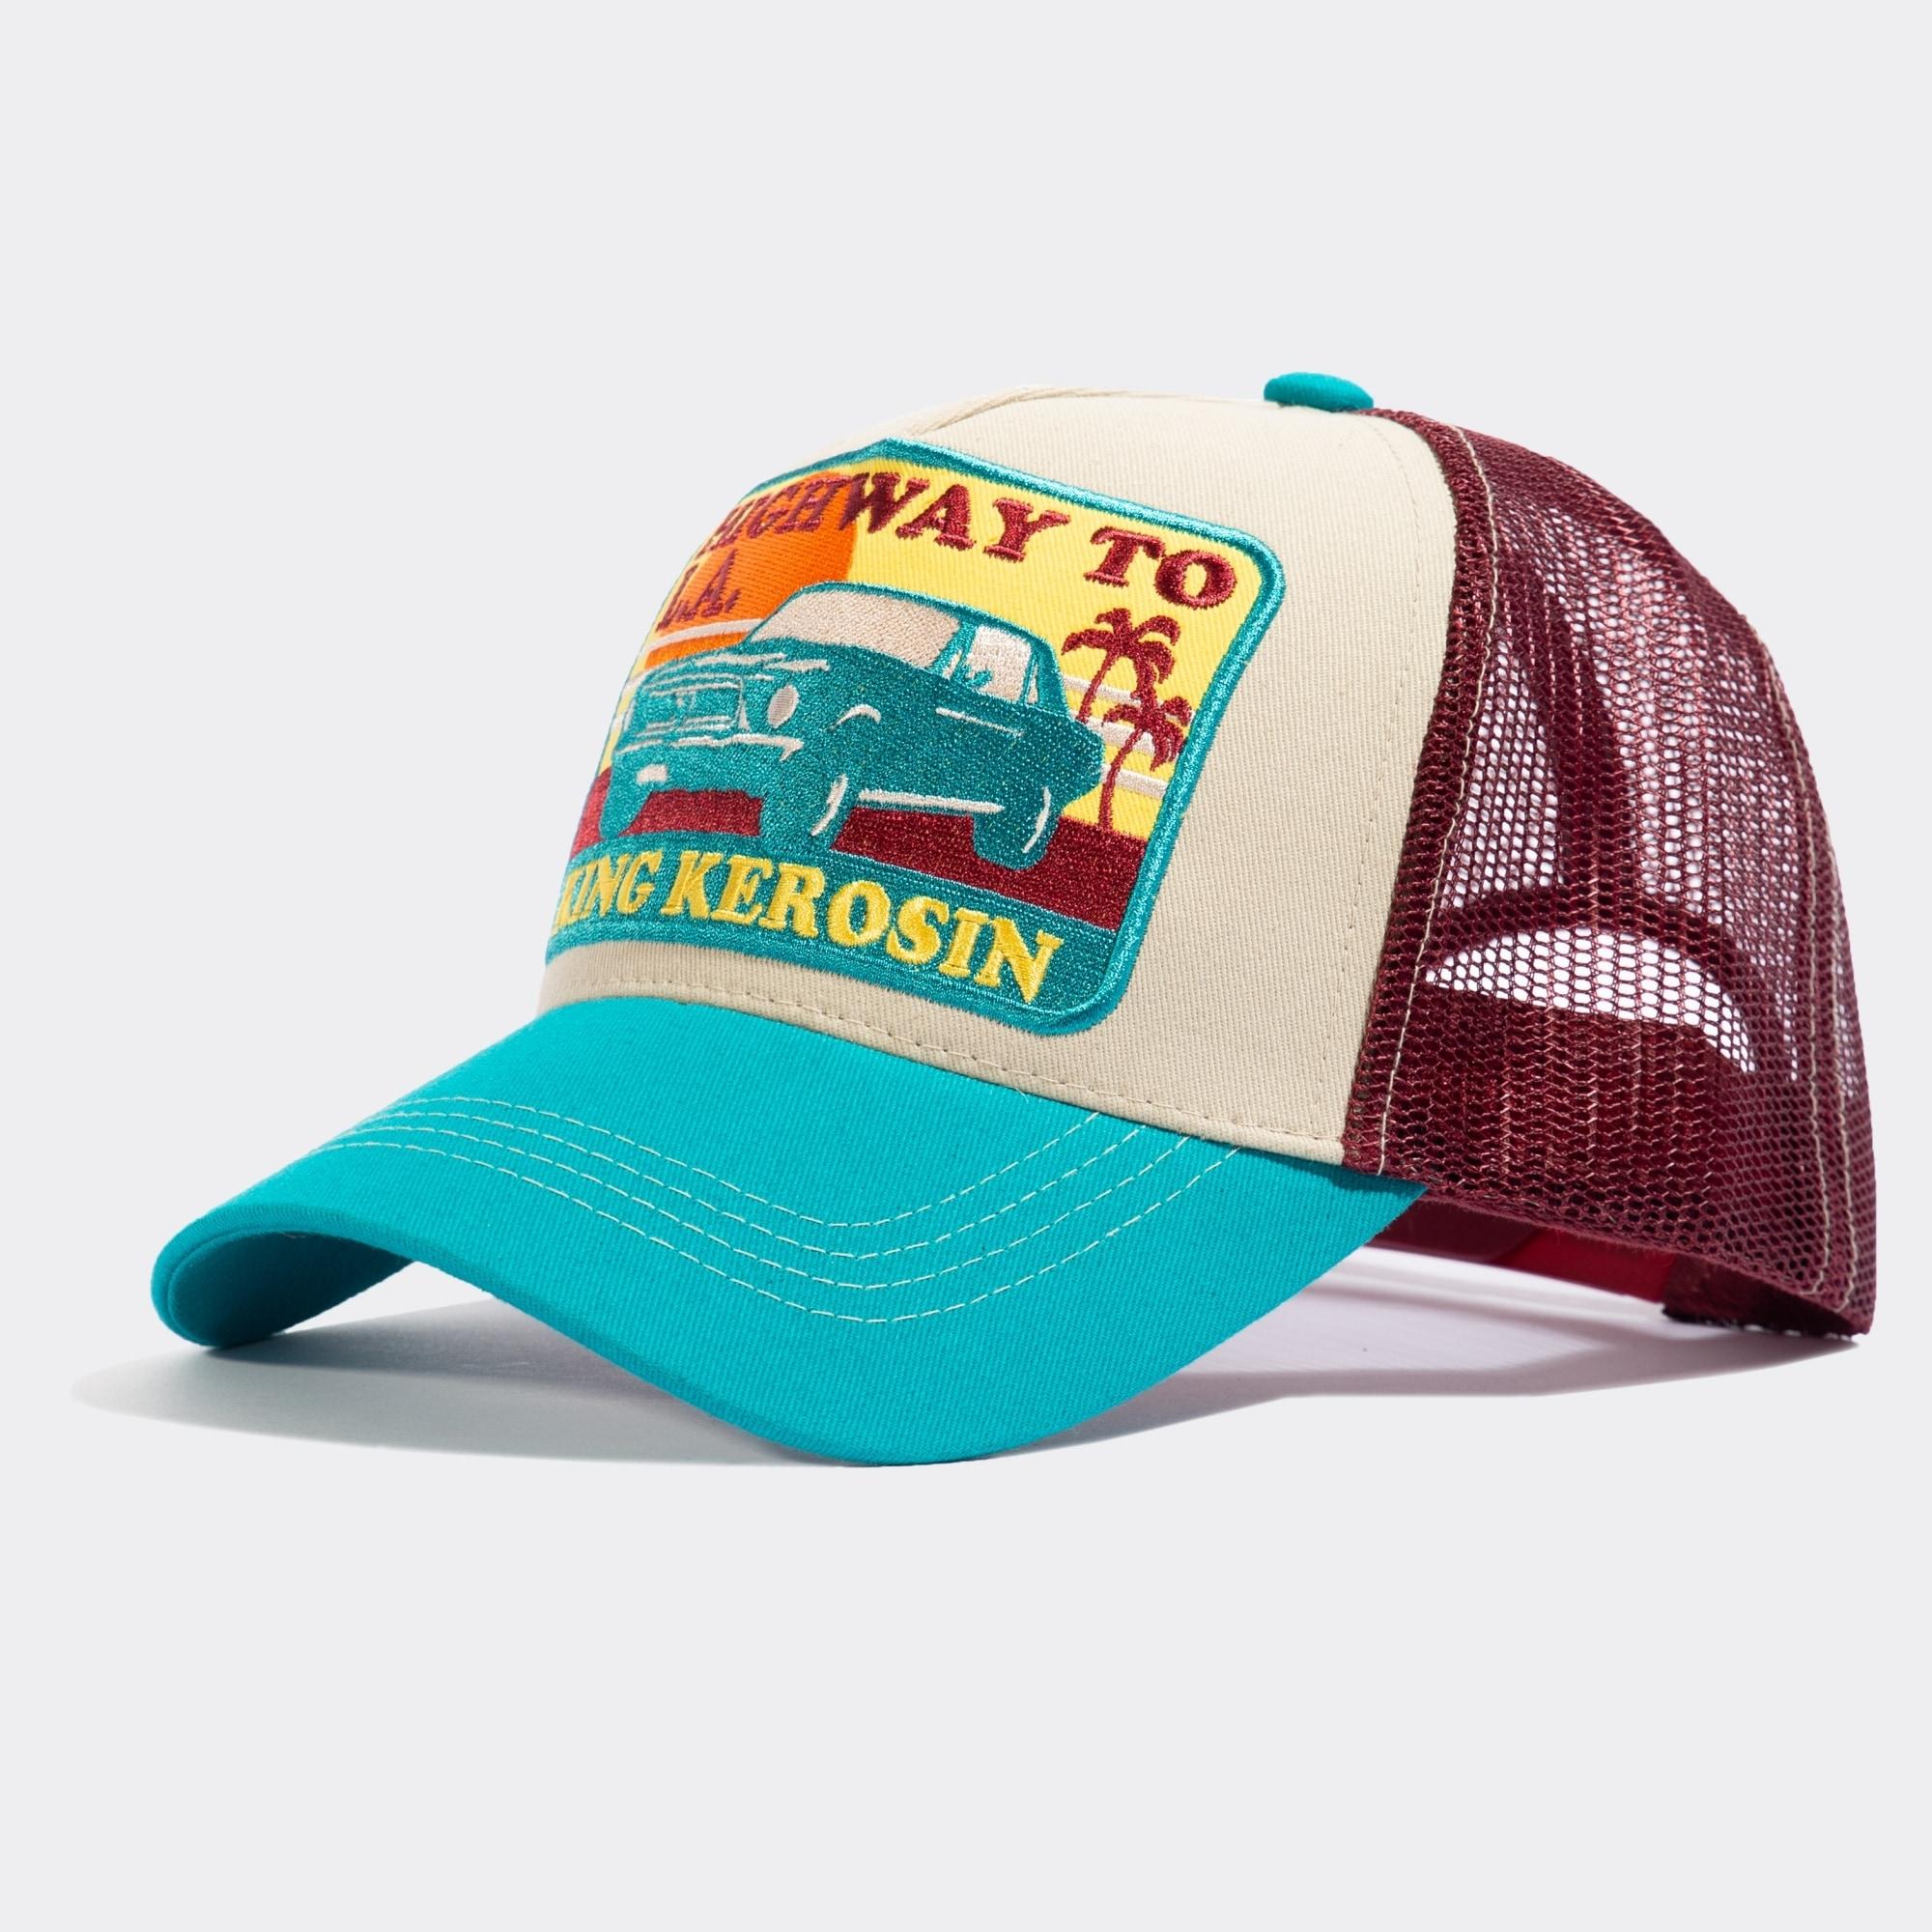 kingkerosin -  Trucker Cap Highway to LA, mit coolem Retro-Patch